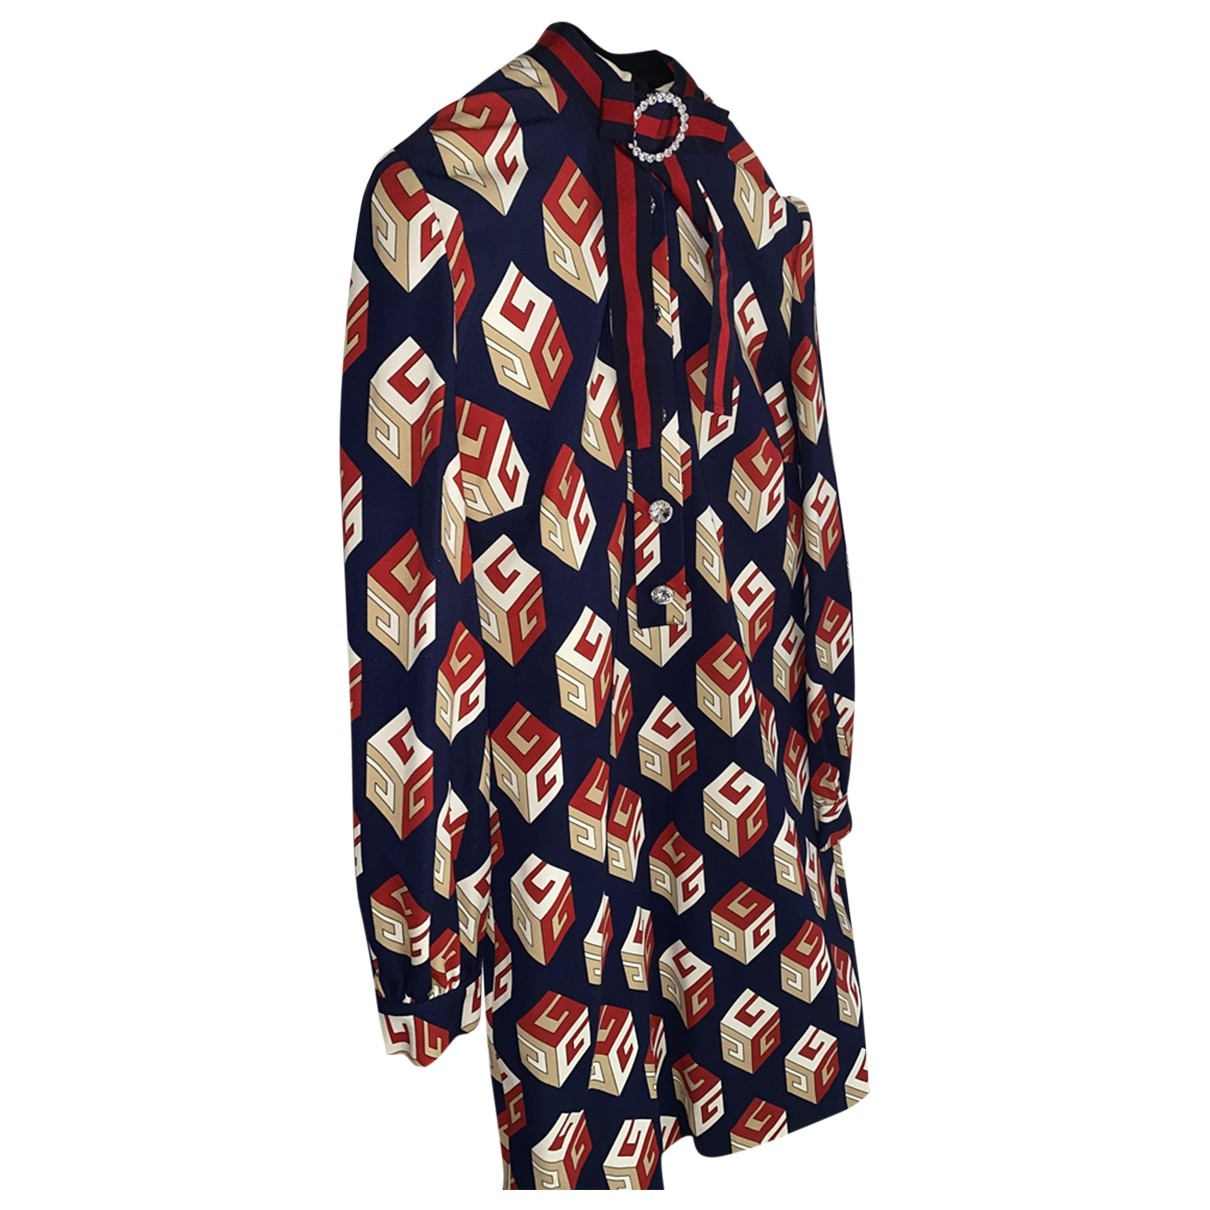 Gucci \N Multicolour dress for Women M International